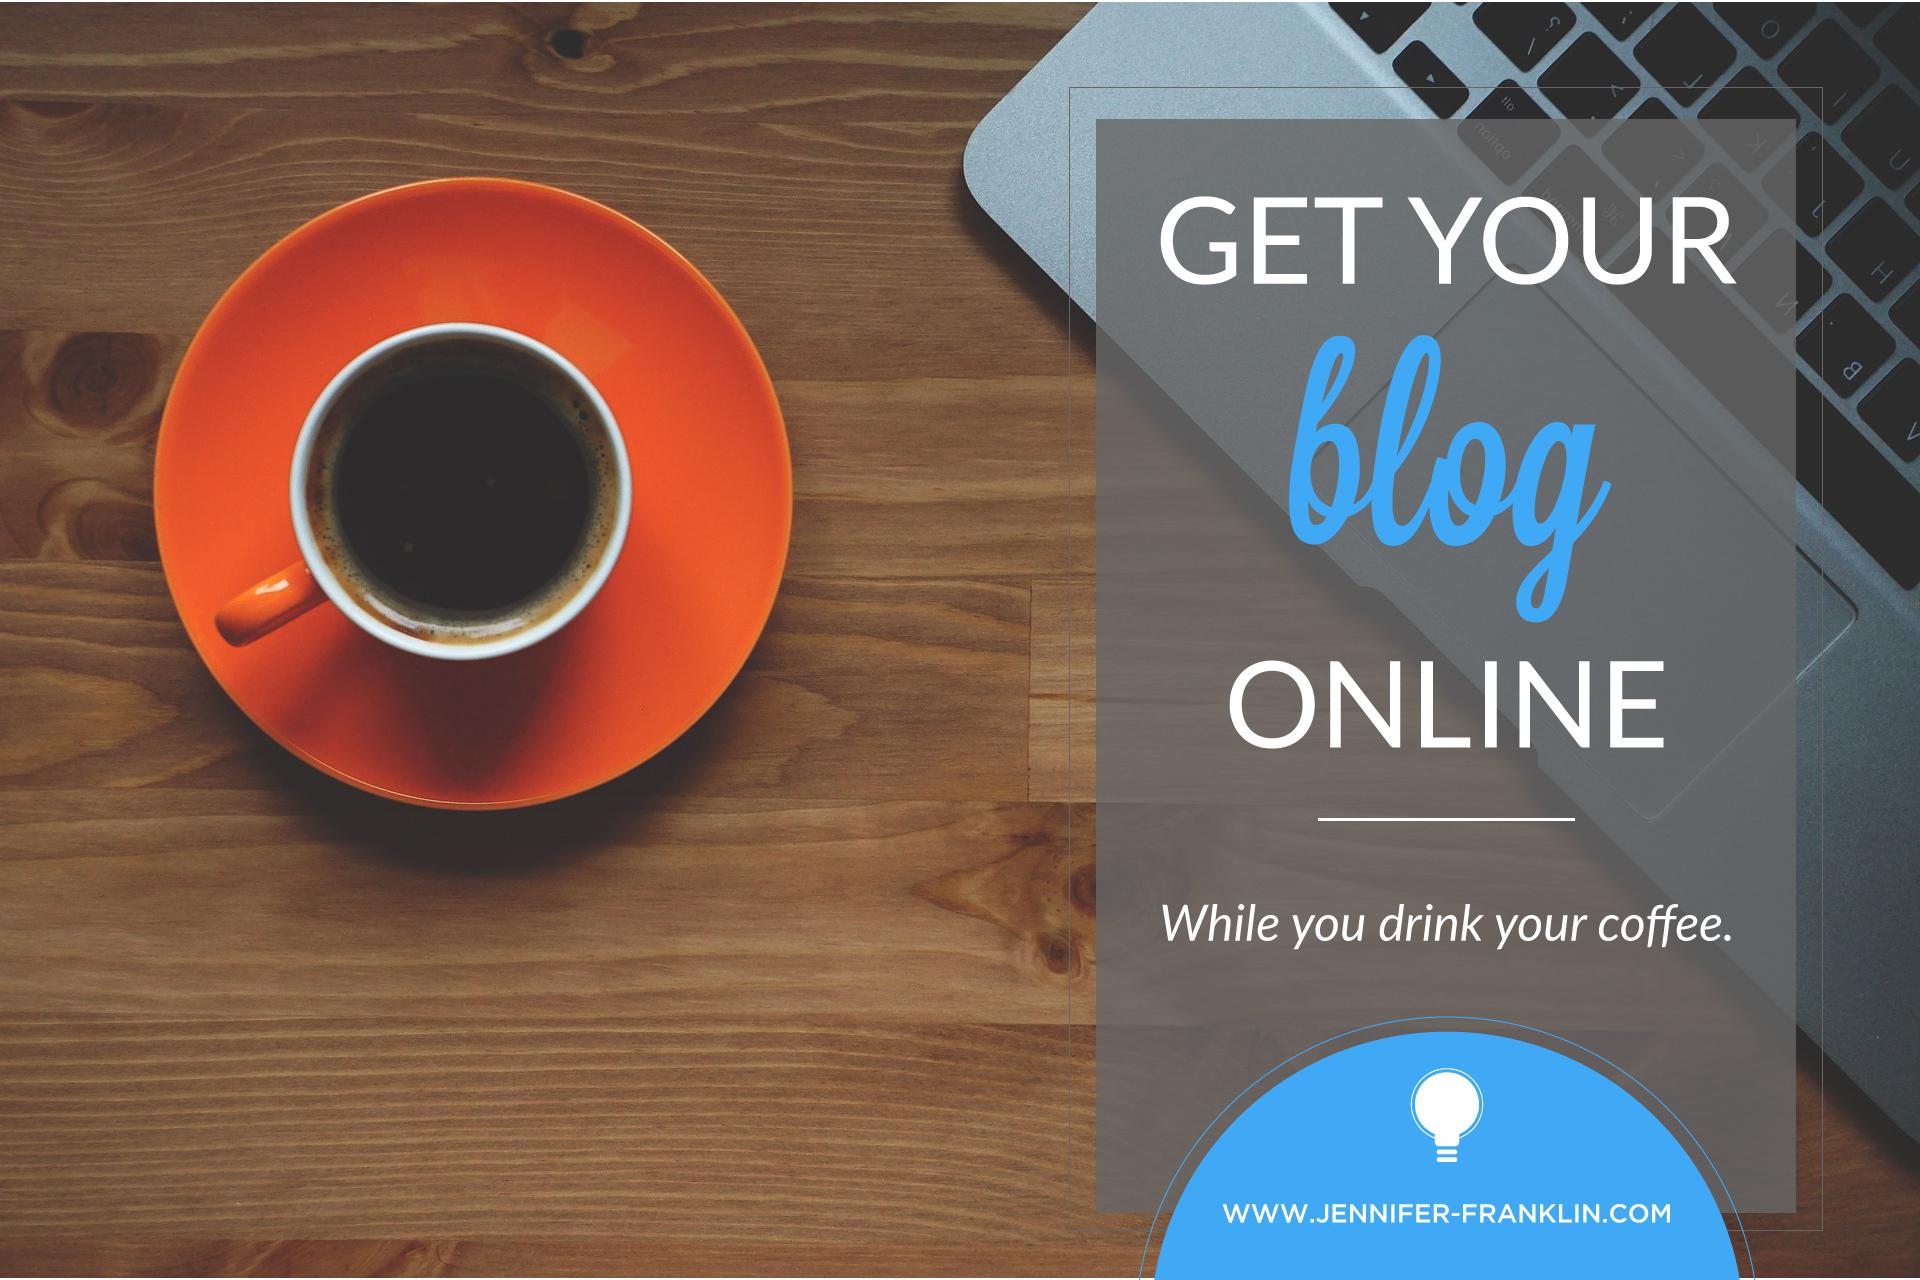 Get Your Blog Online